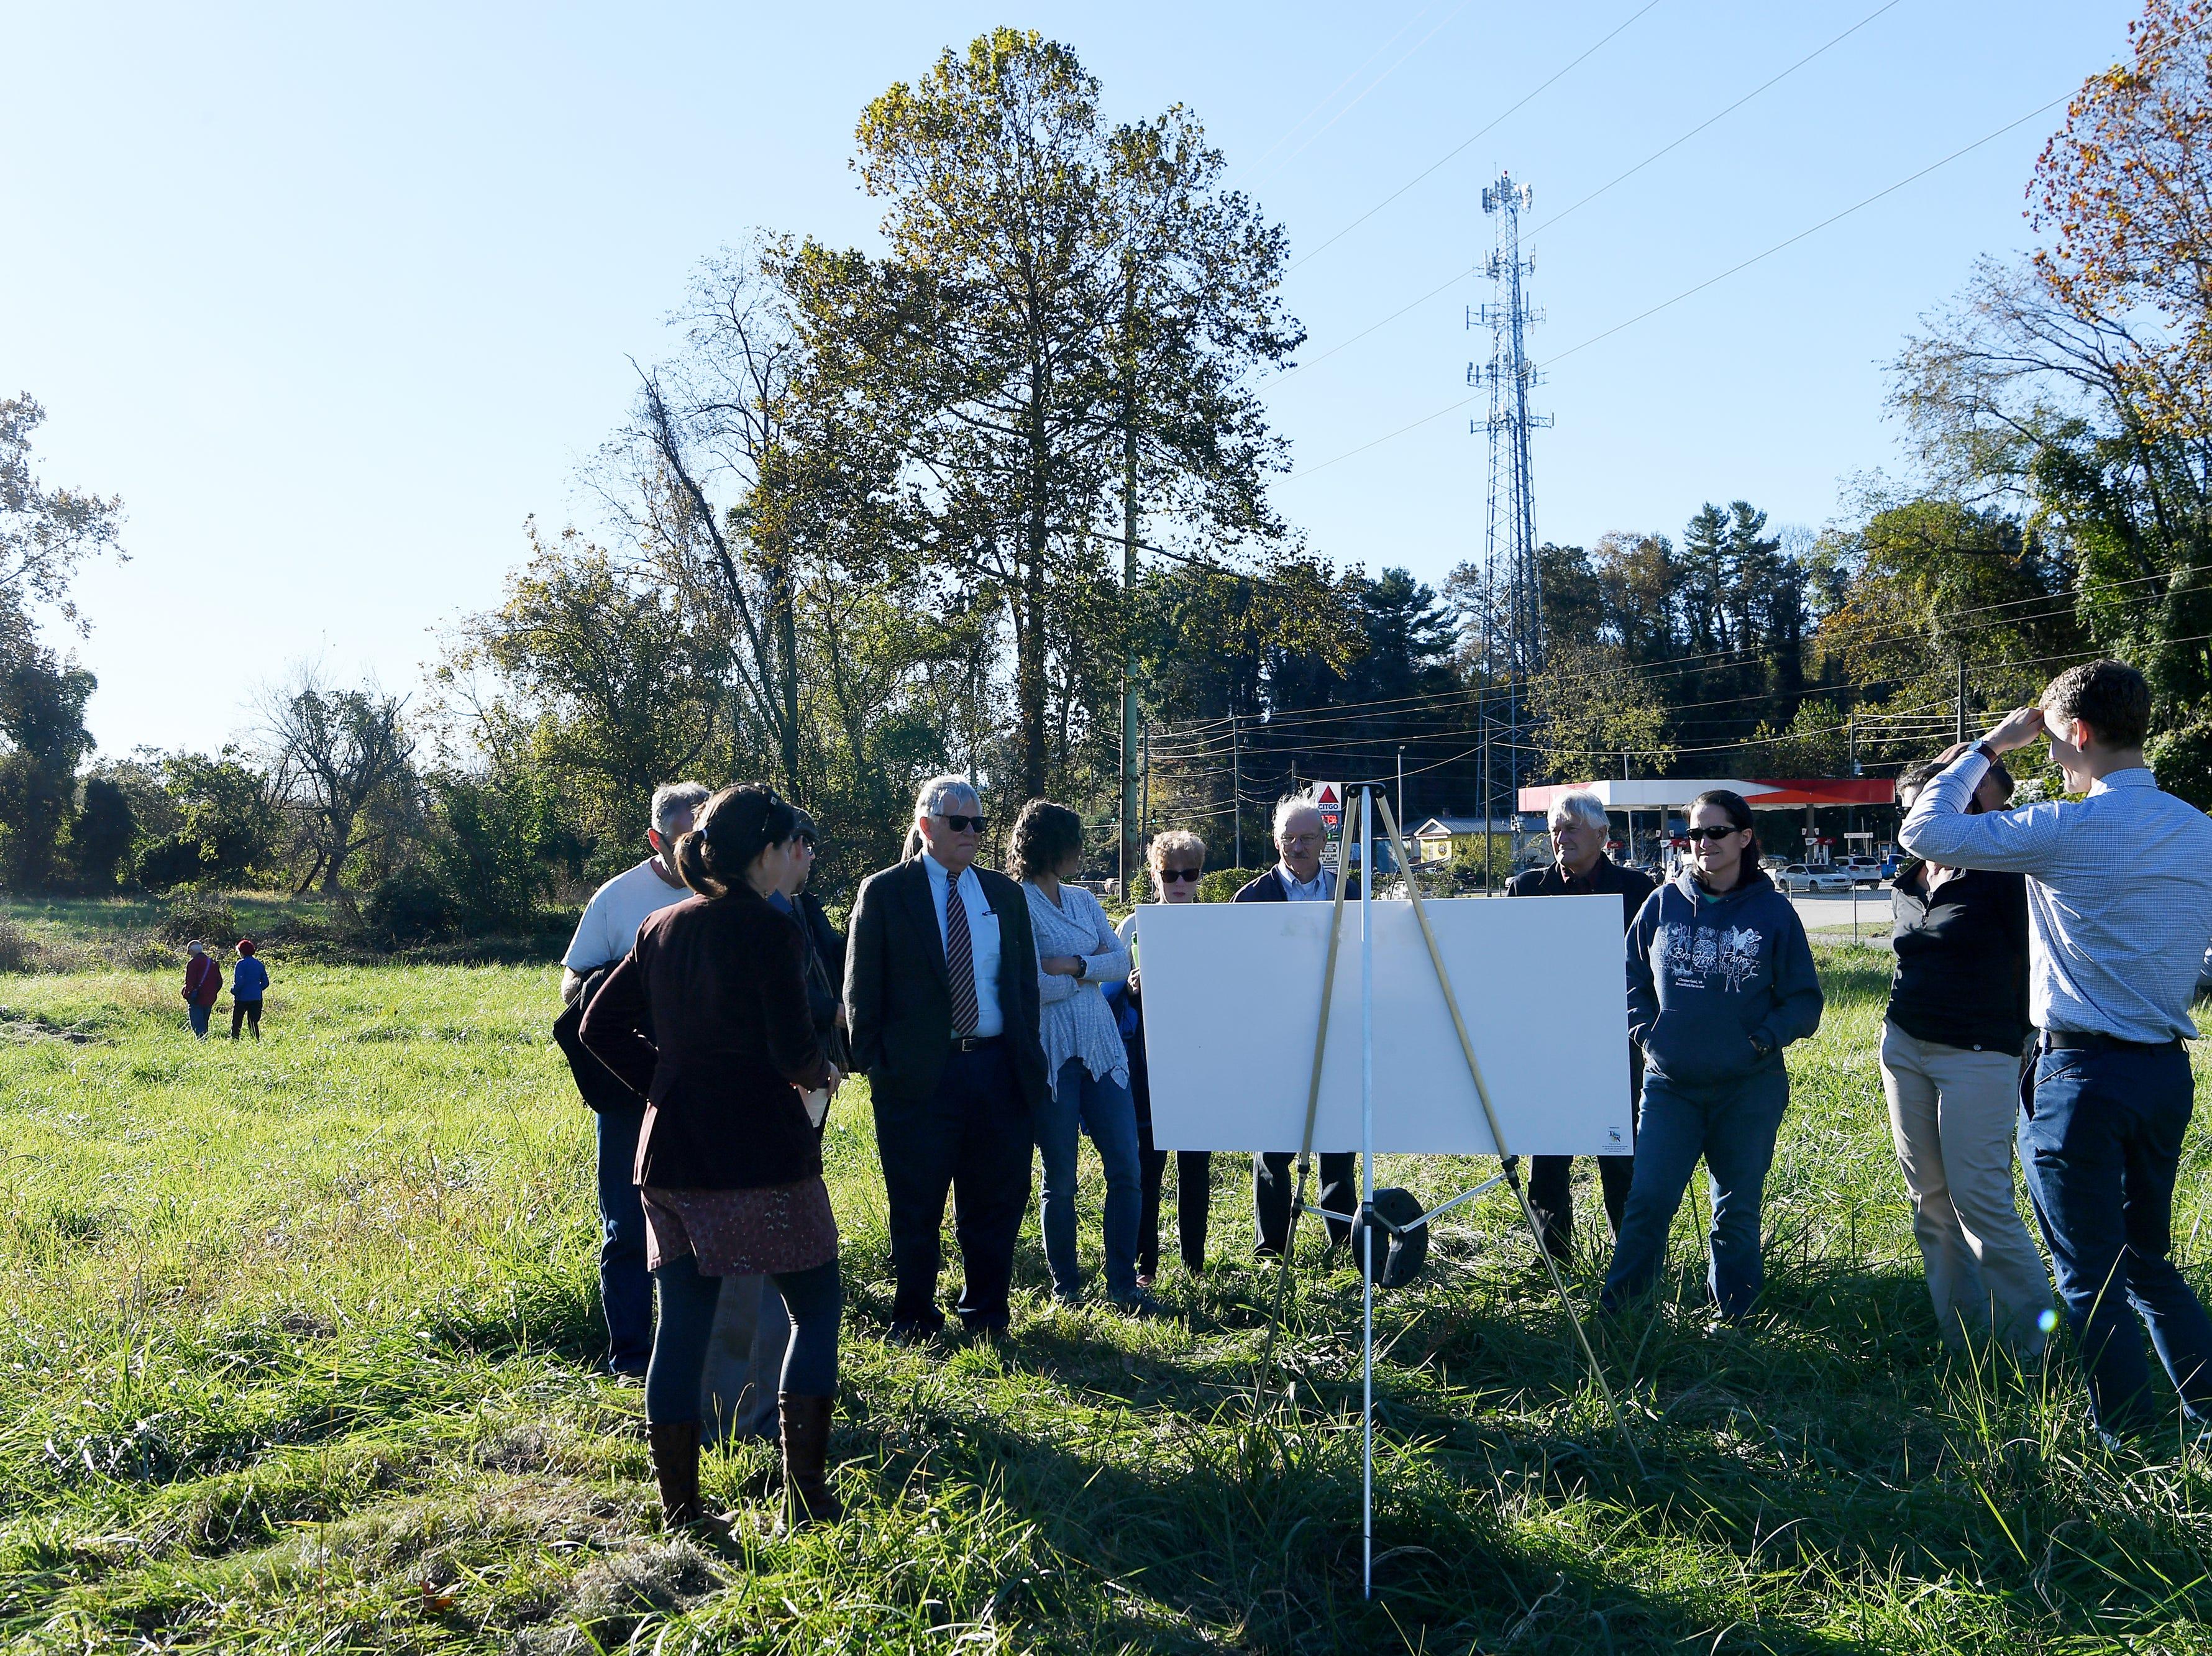 RiverLink revealed the draft master plan Oct. 29, 2018 for Karen Cragnolin Park, a 5-acre former junkyard on Amboy Road and along the French Broad River.